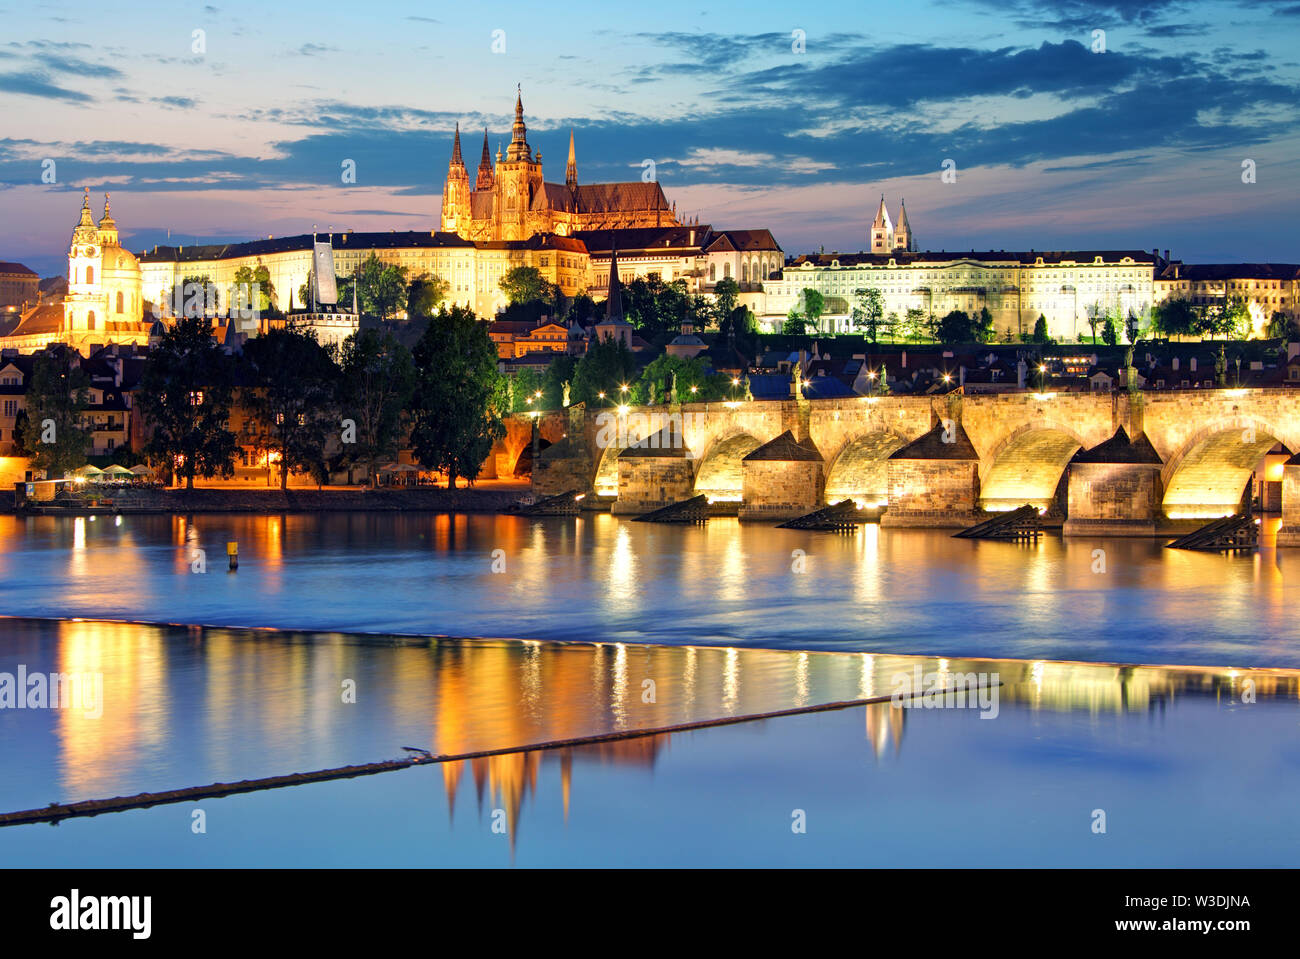 Prague castle and Charles bridge at night - Stock Image